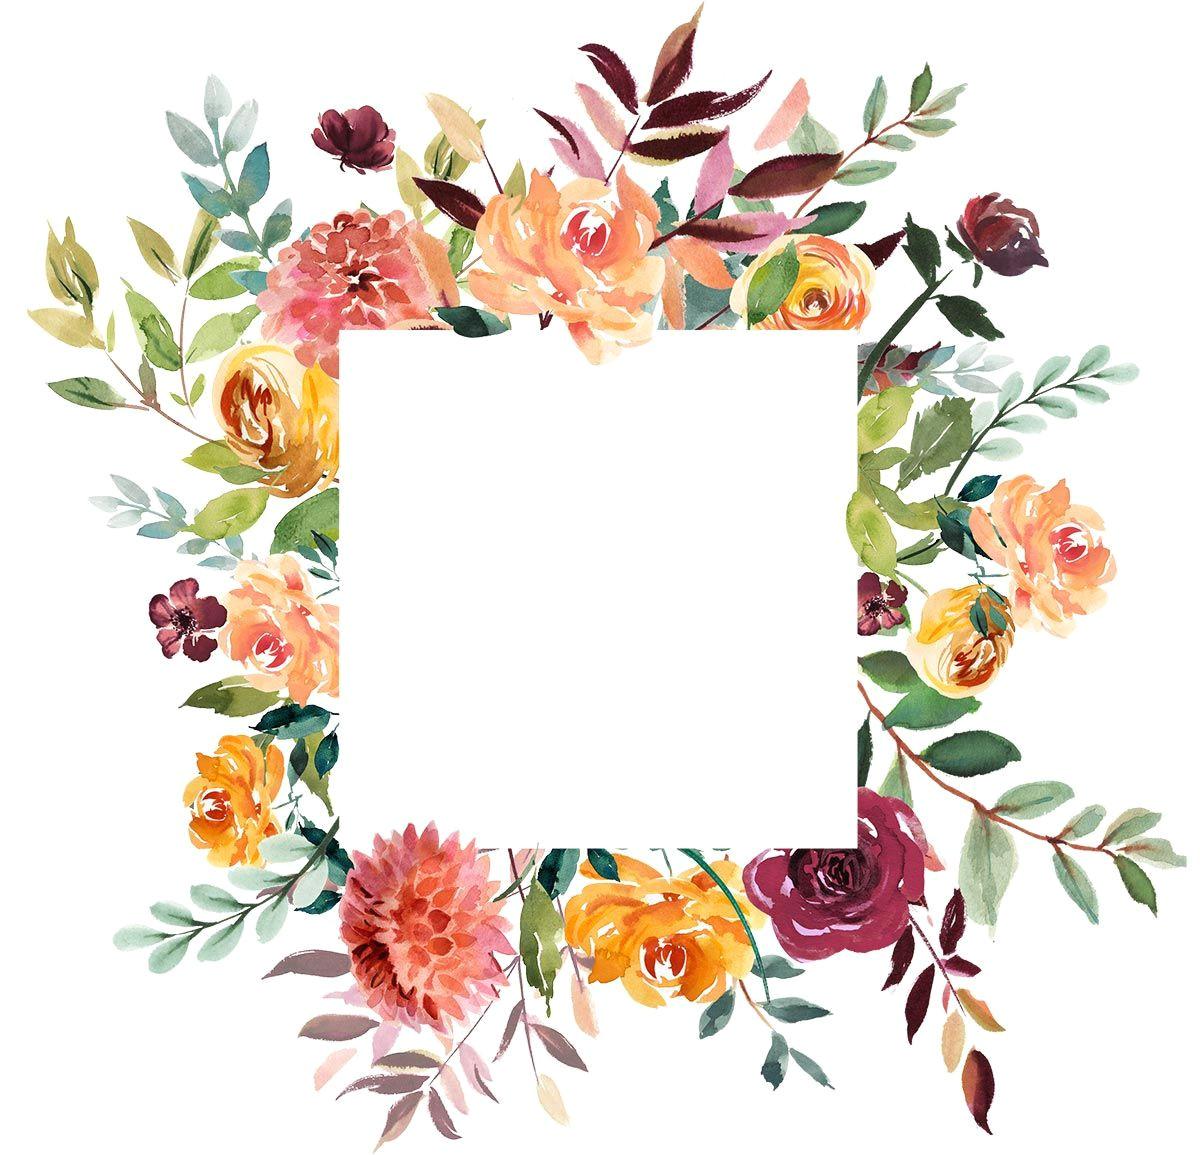 d don d d d n dod d d watercolor design watercolor flowers banners colorful drawings art drawings flower